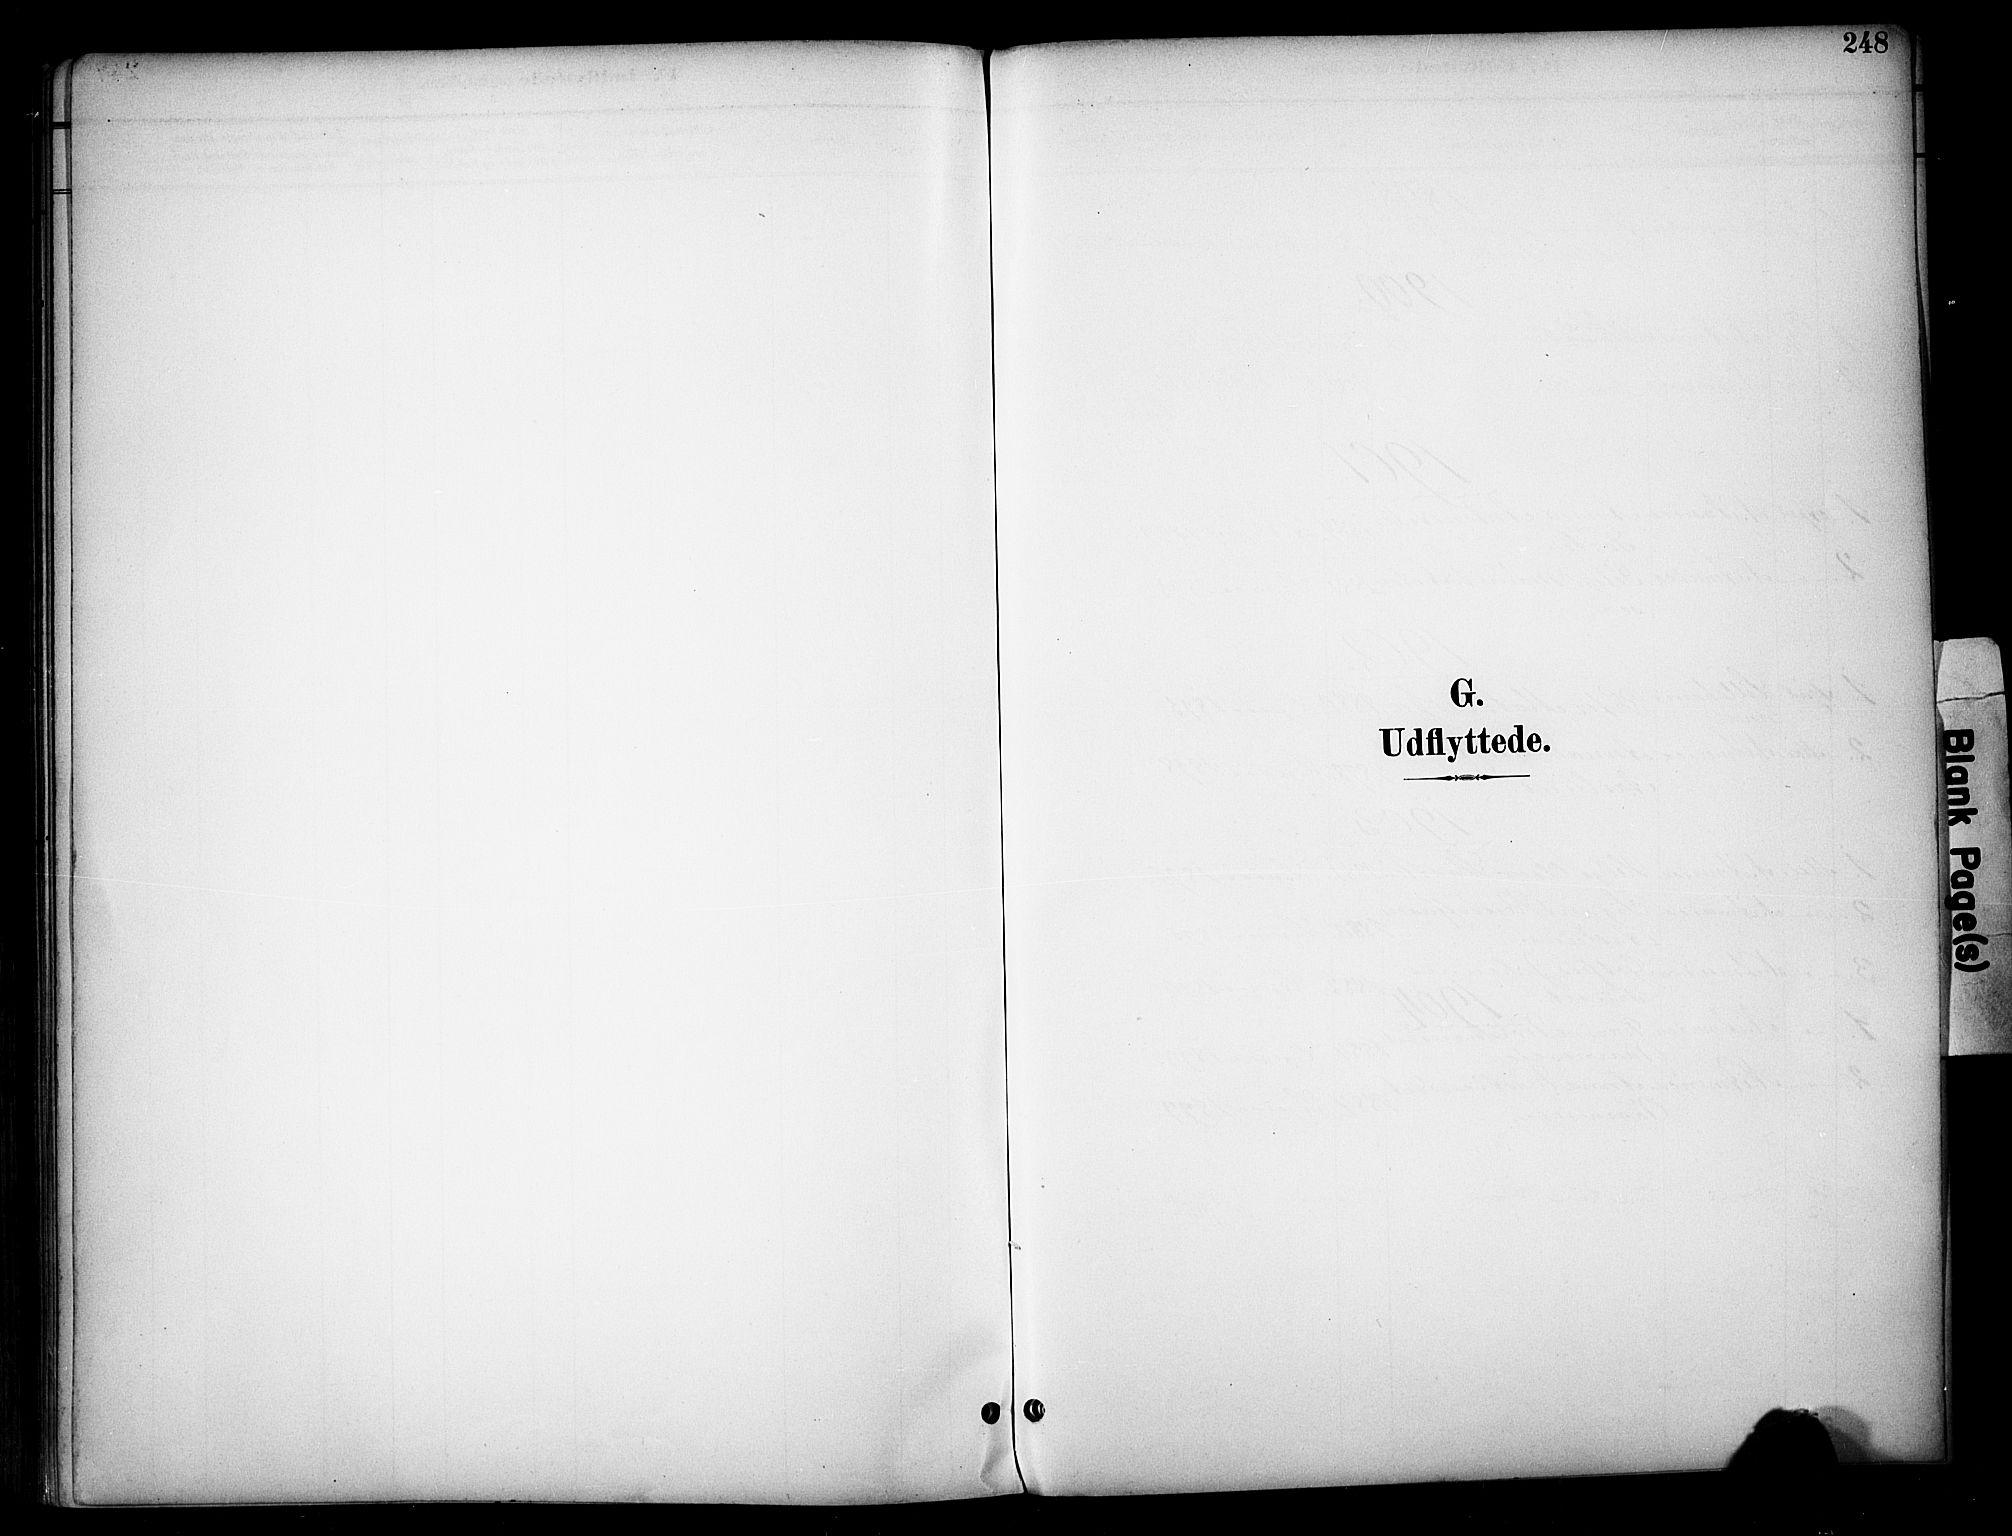 SAH, Vardal prestekontor, H/Ha/Haa/L0012: Ministerialbok nr. 12, 1893-1904, s. 248